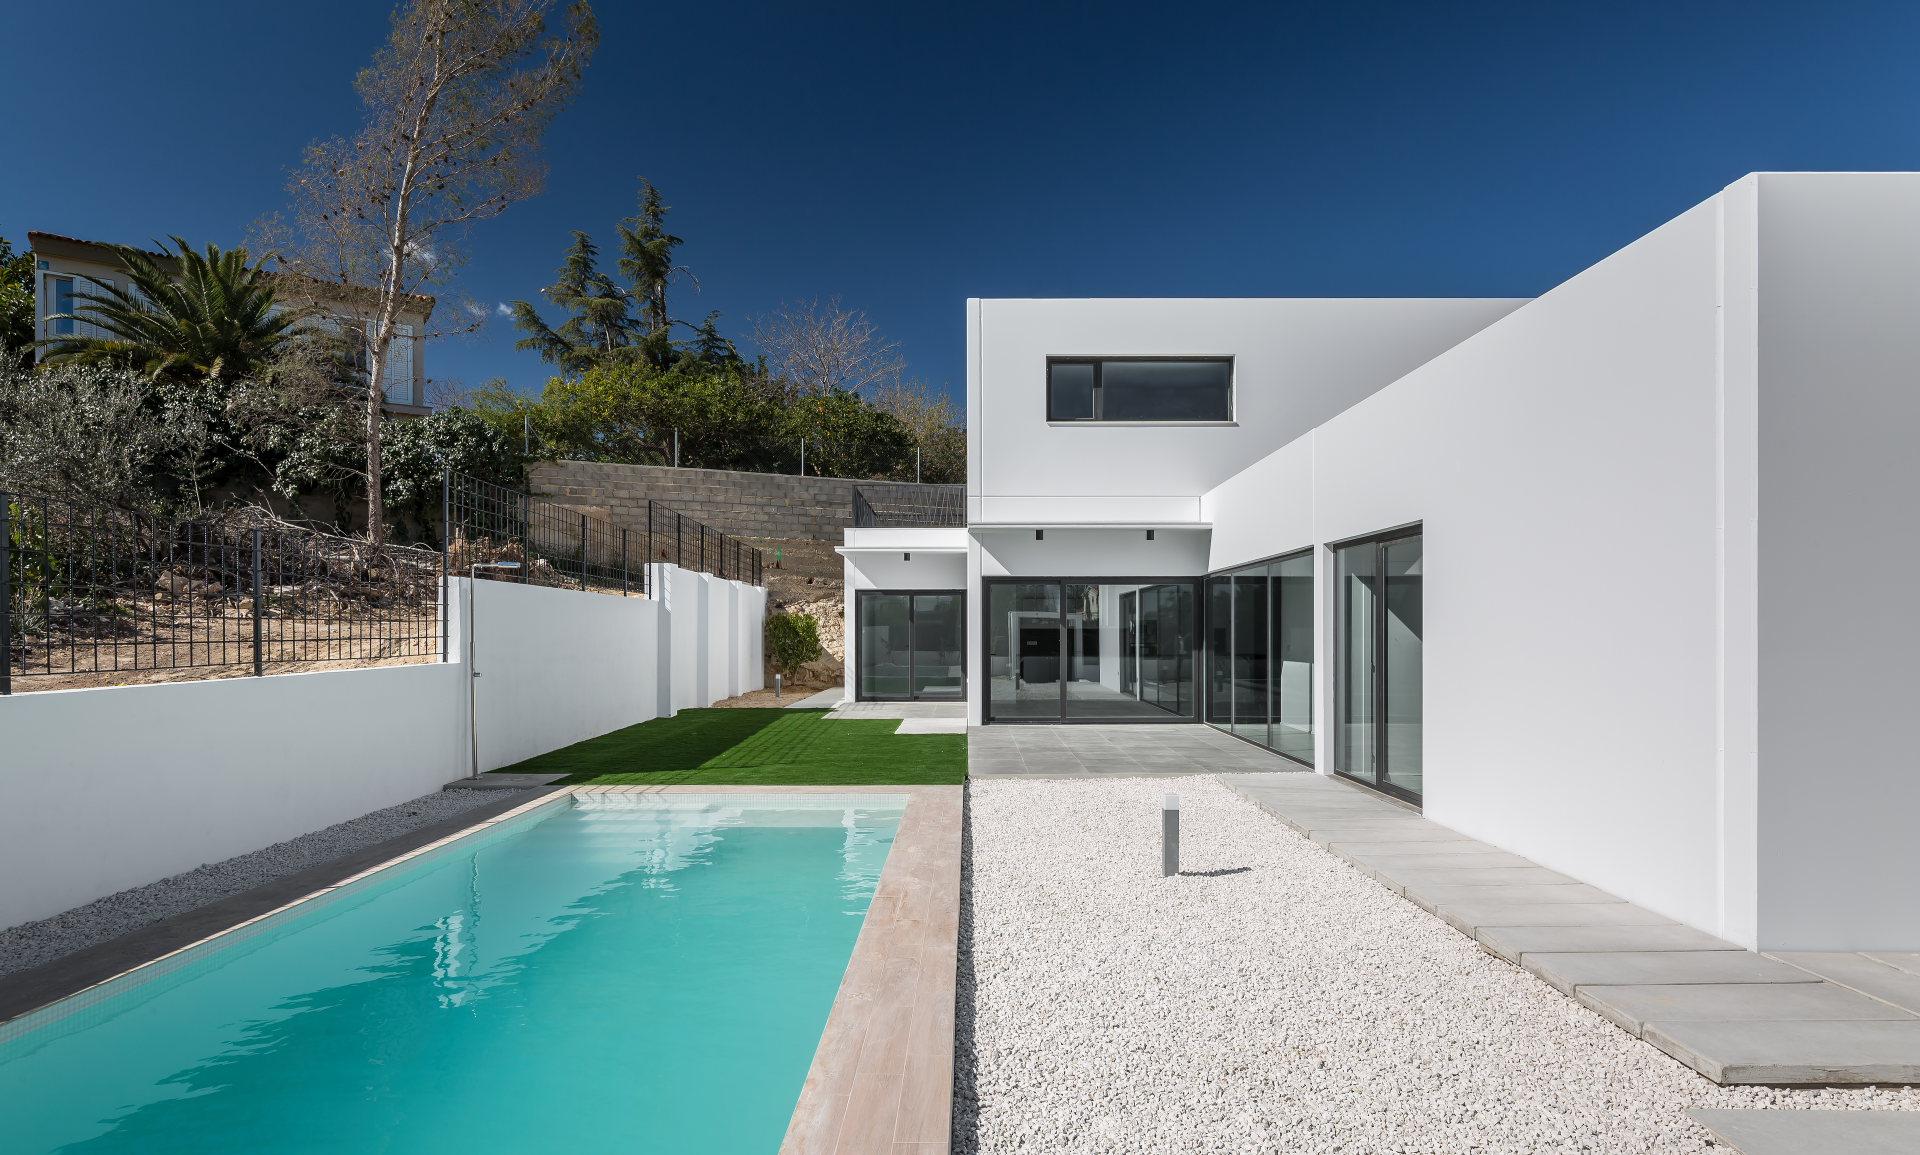 fotografia-arquitectura-valencia-german-cabo-viraje-el-vedat-torrent (3)